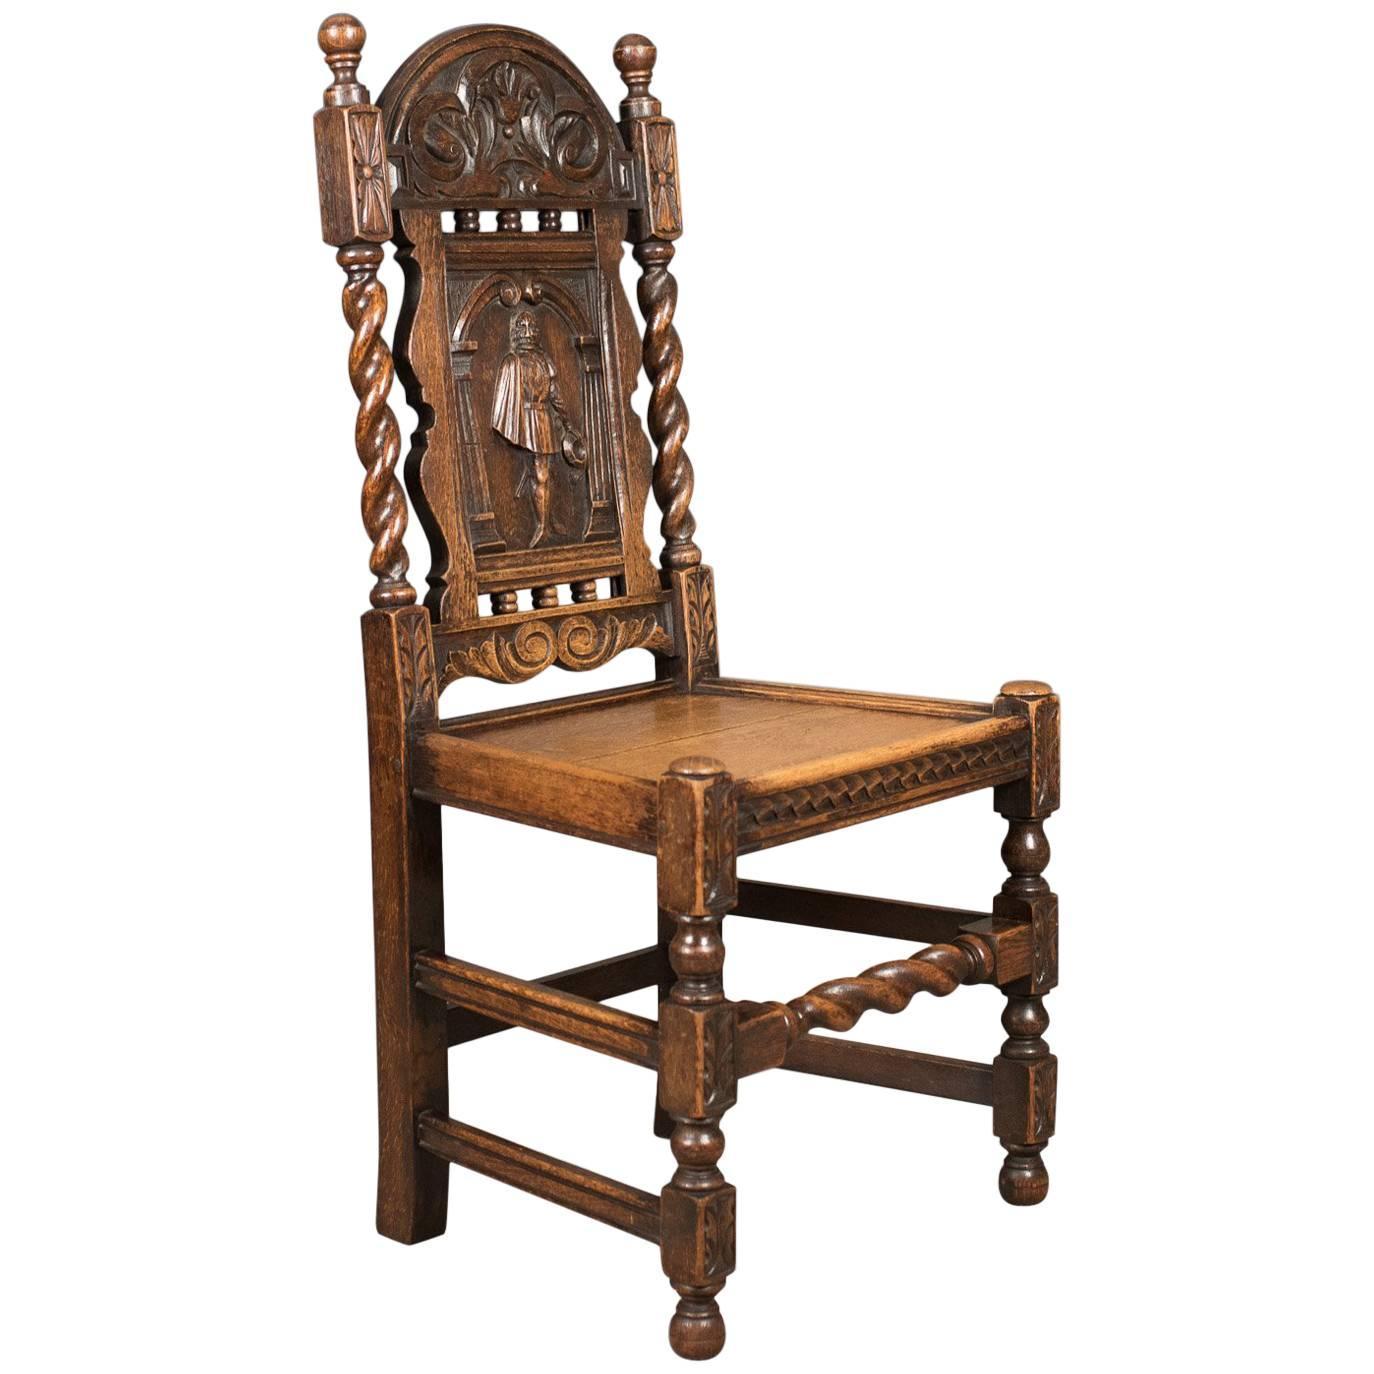 Antique Flemish Hall Chair, Carved Oak, Circa 1900